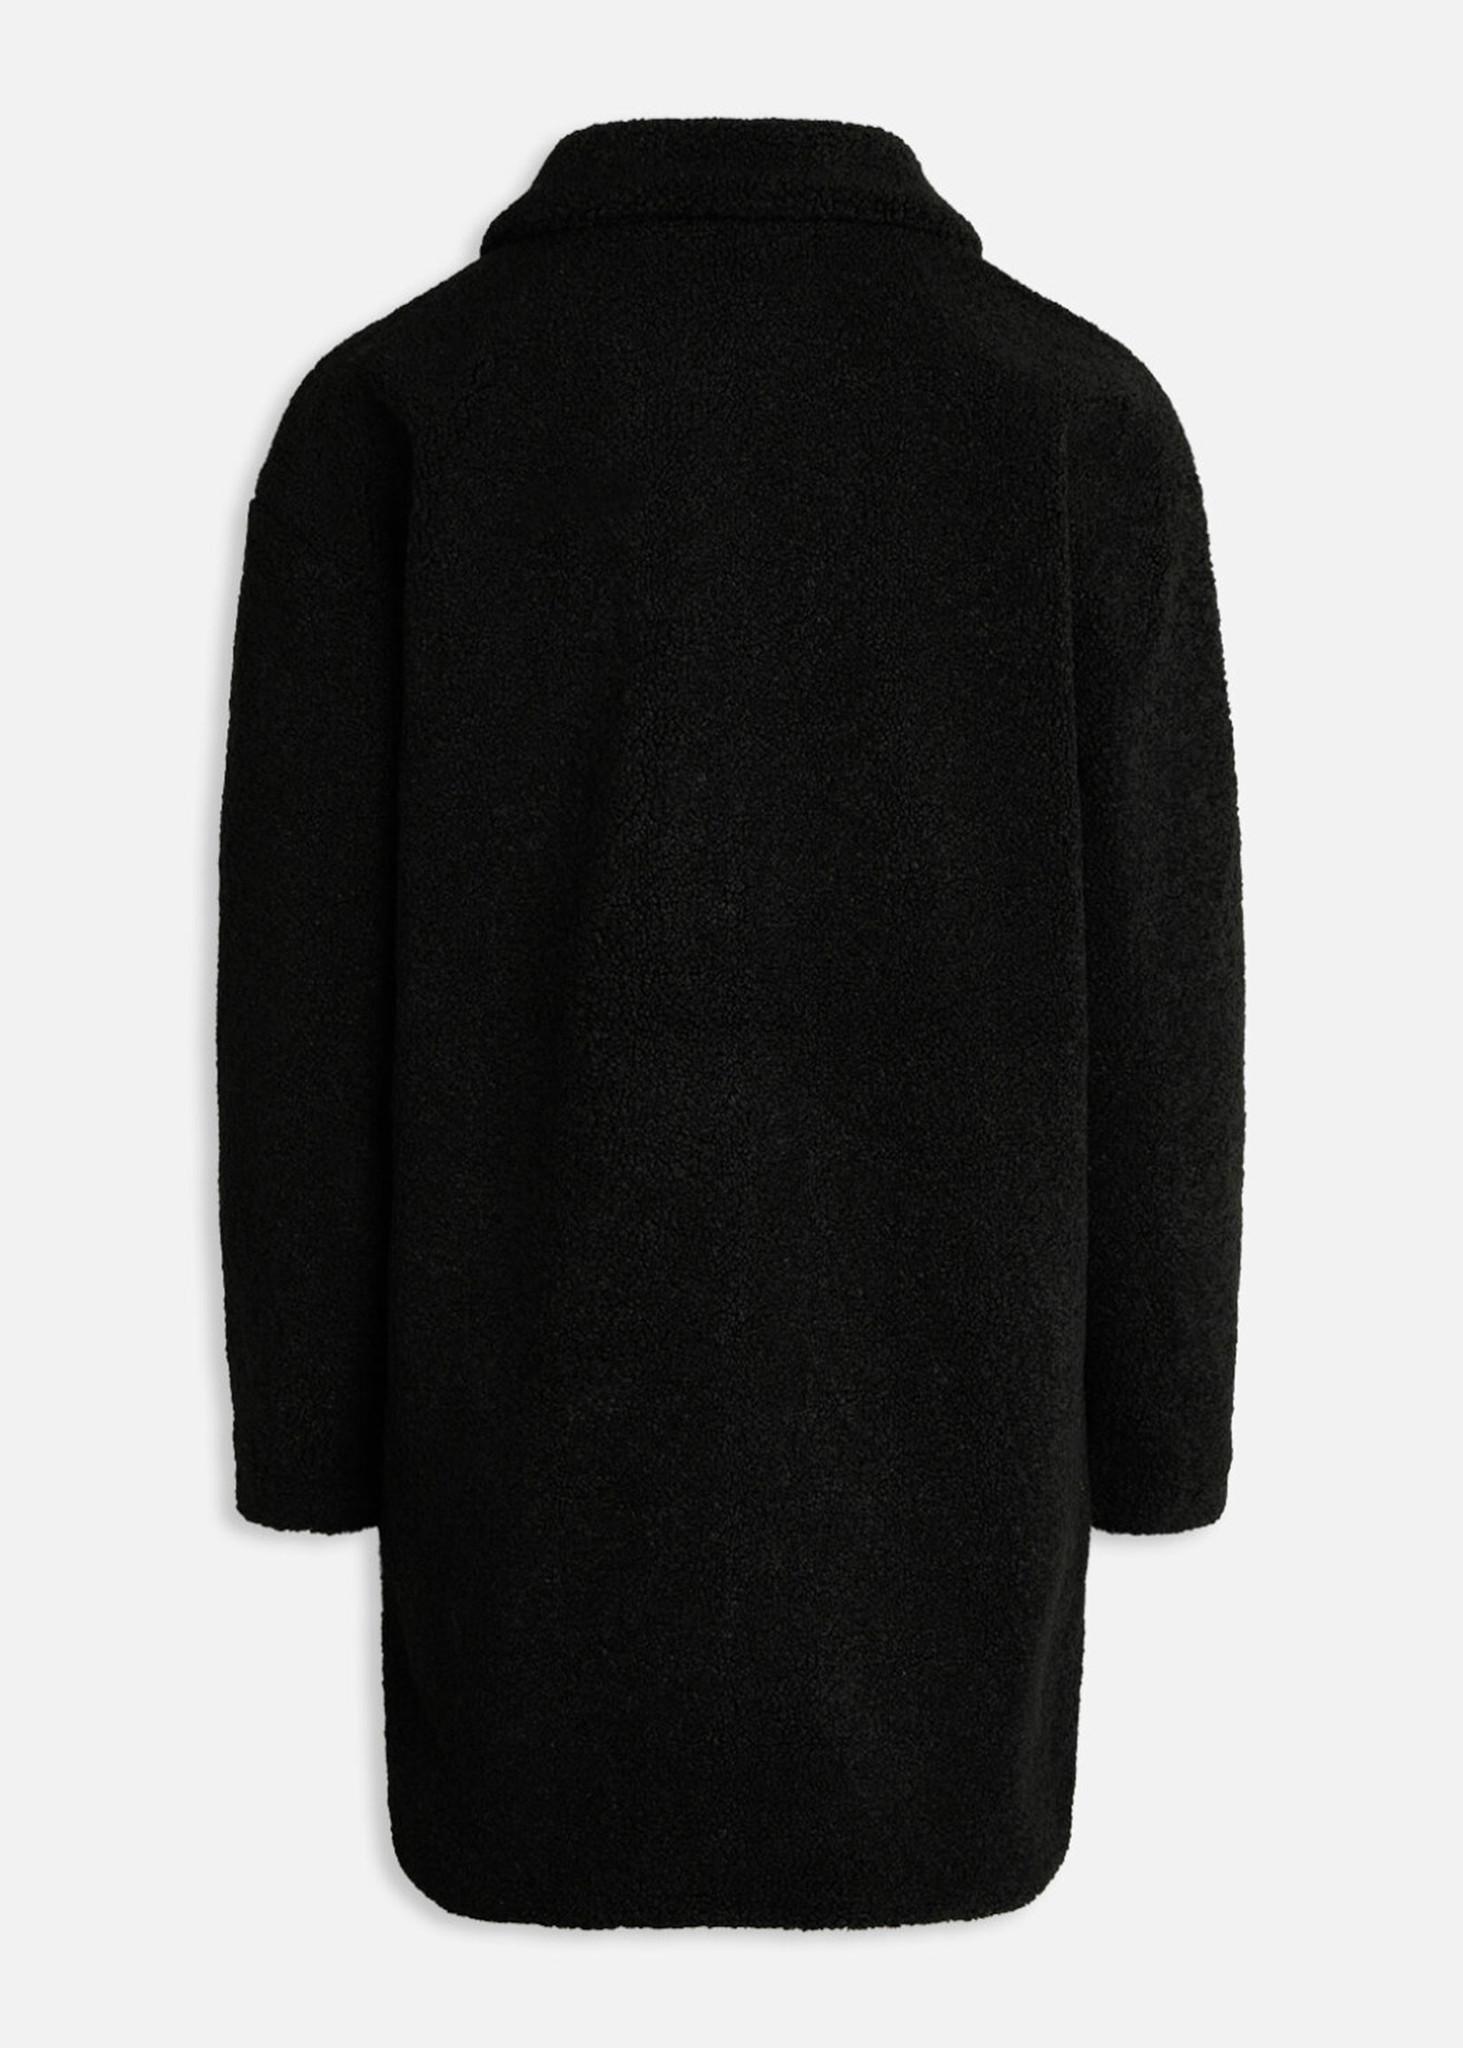 Dofi Jacket Black-3